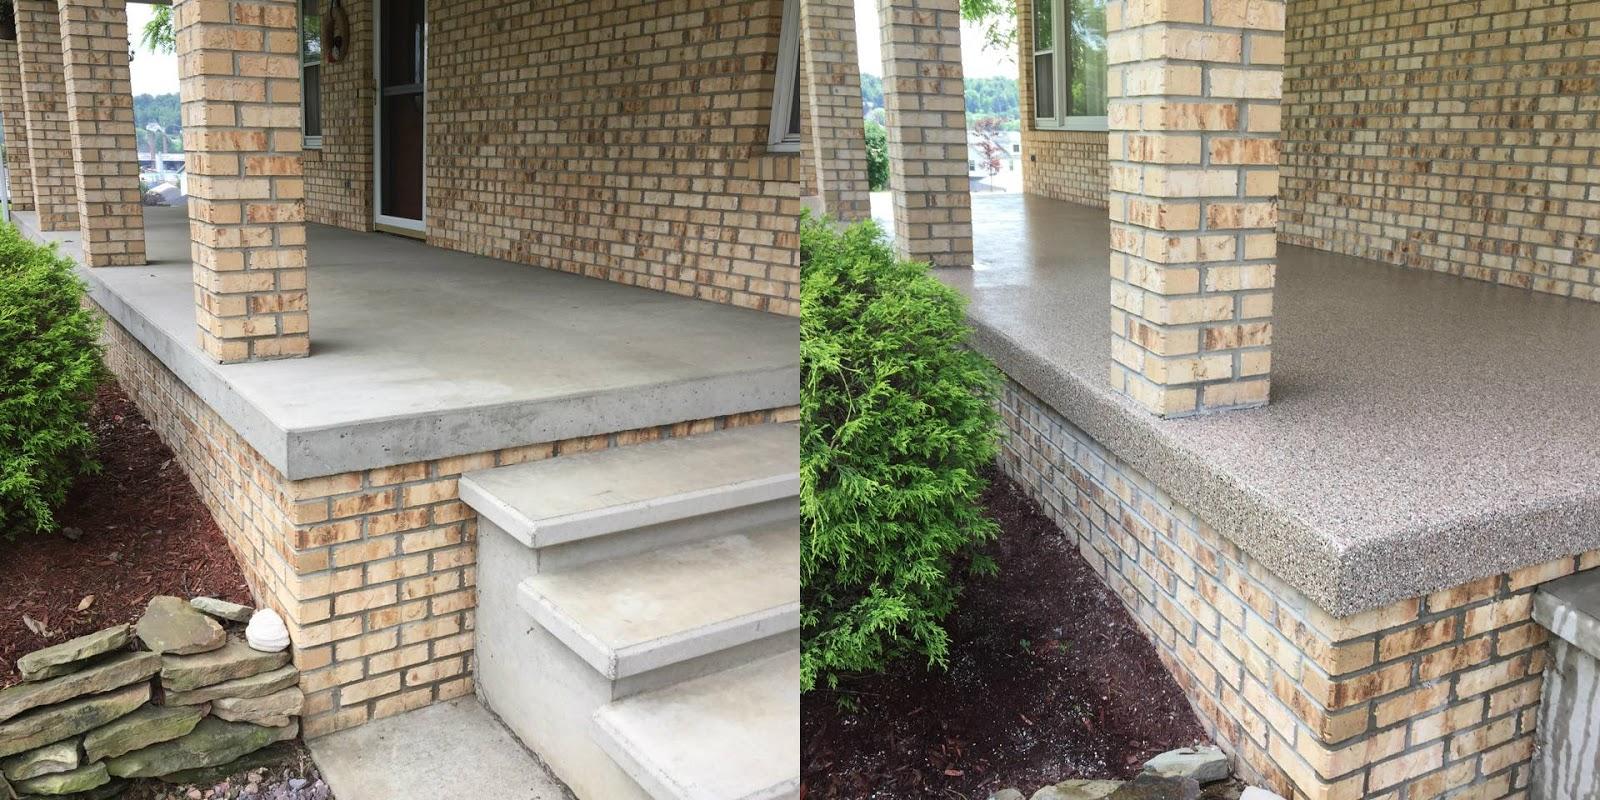 Rhino Flooring Of St Marys Concrete Crack Repair Services